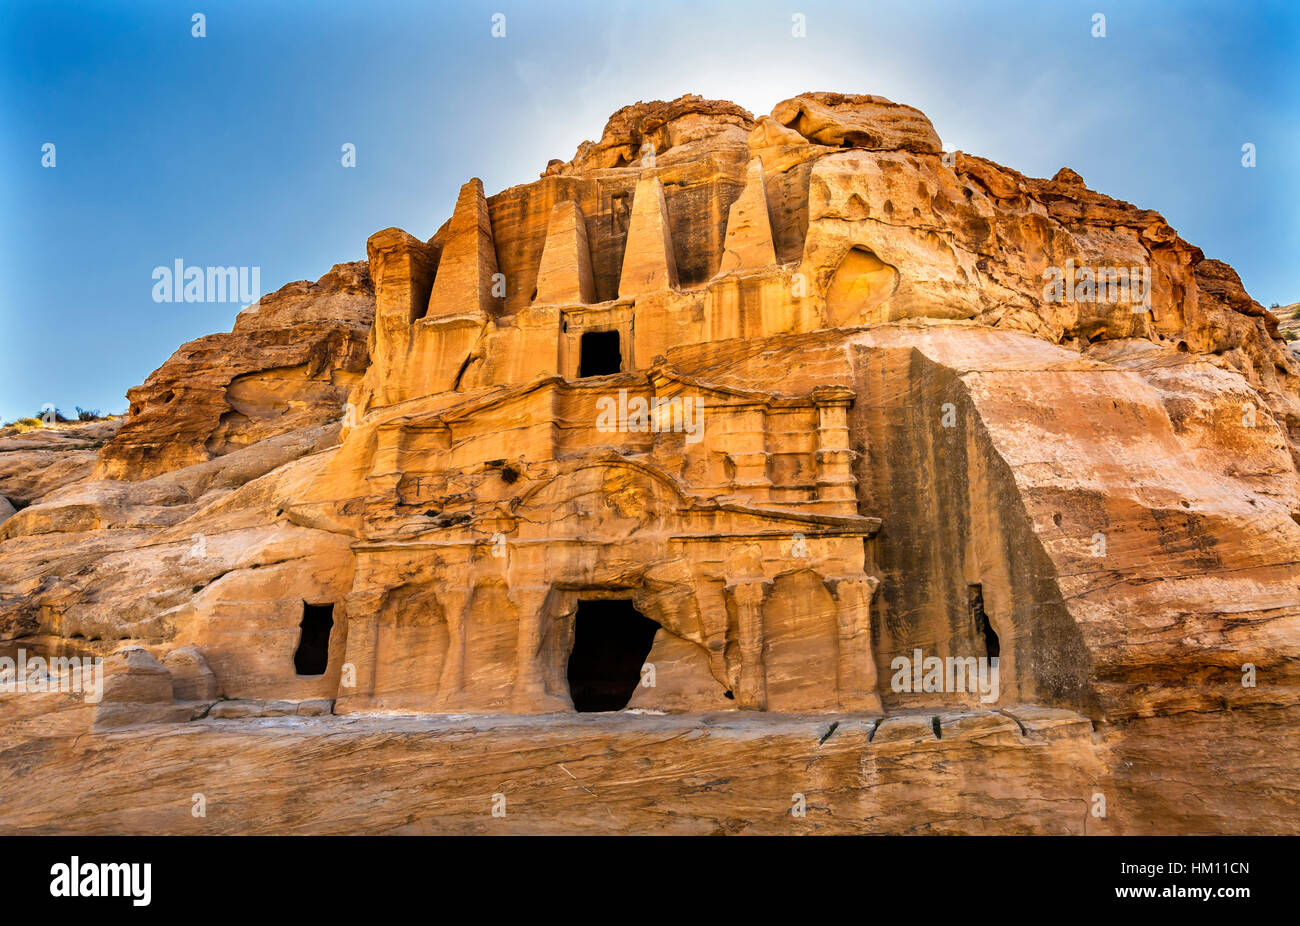 Obélisque jaune tombe Bab el-siq Triclinium extra-Siq Canyon randonnée jusqu'à l'entrée Photo Stock